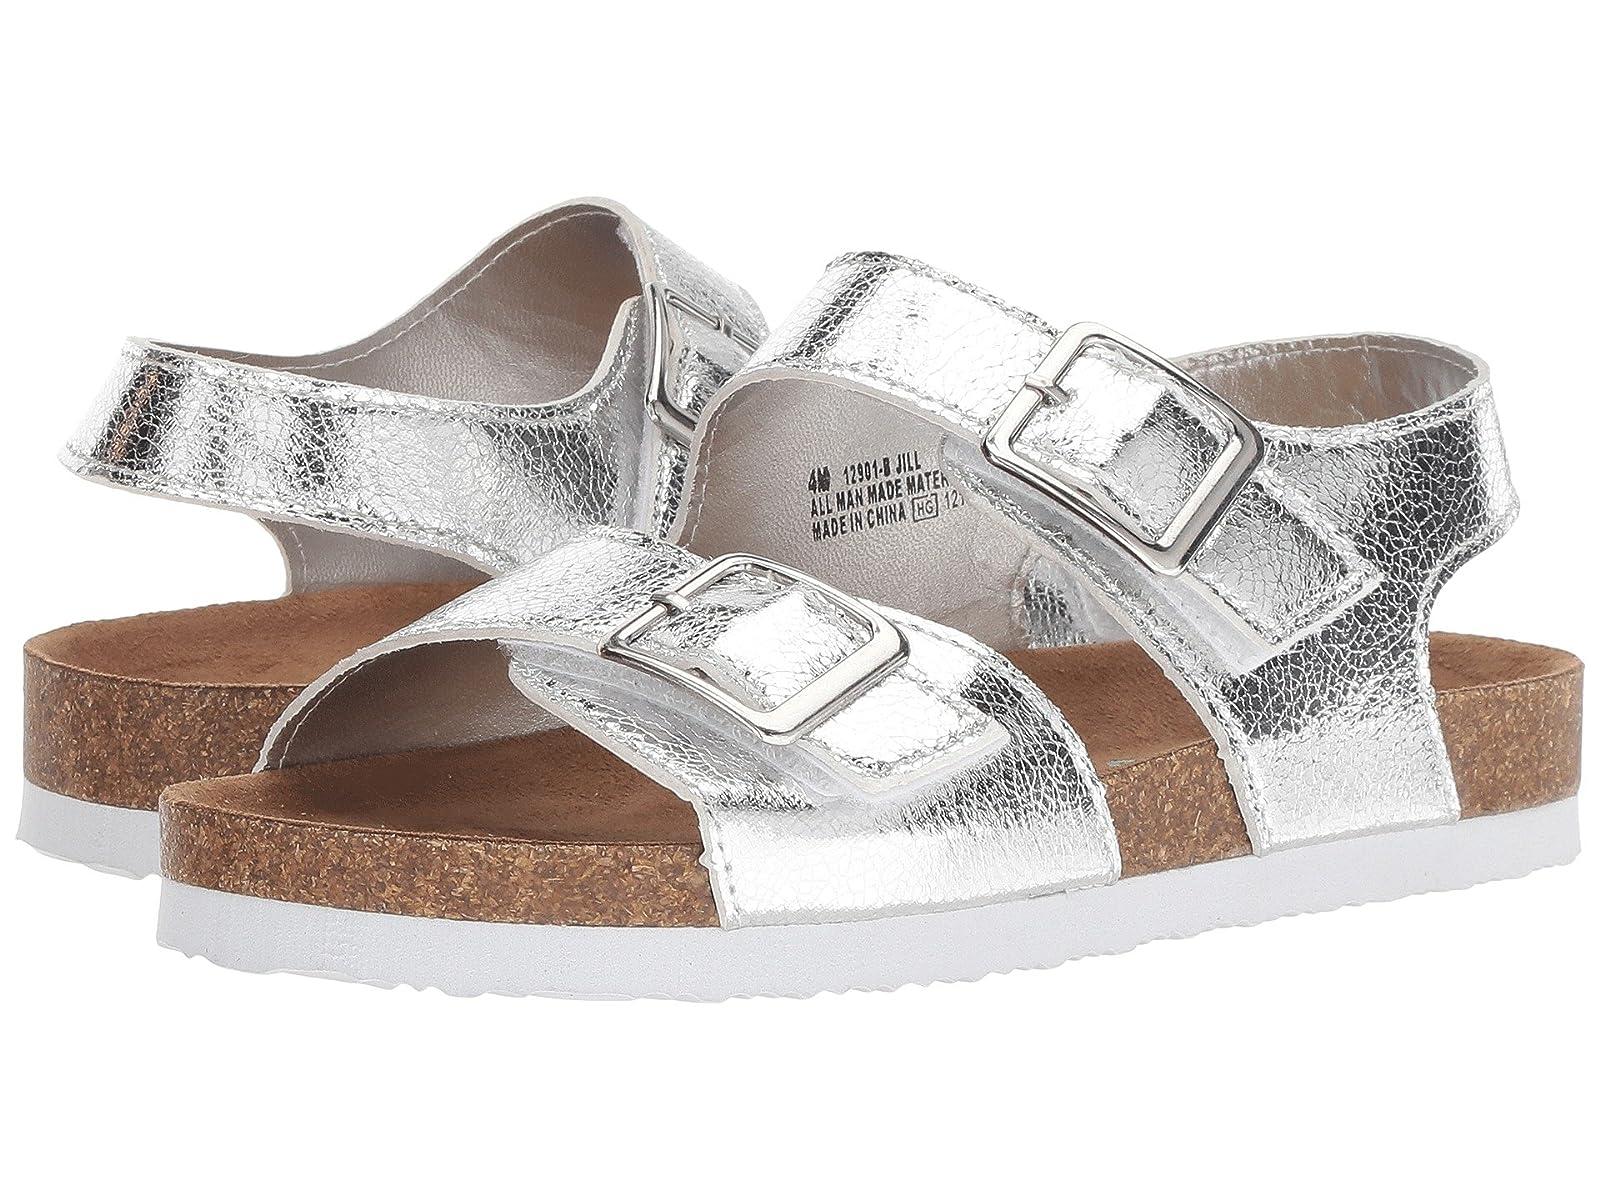 Rachel Kids Jill (Little Kid/Big Kid)Atmospheric grades have affordable shoes